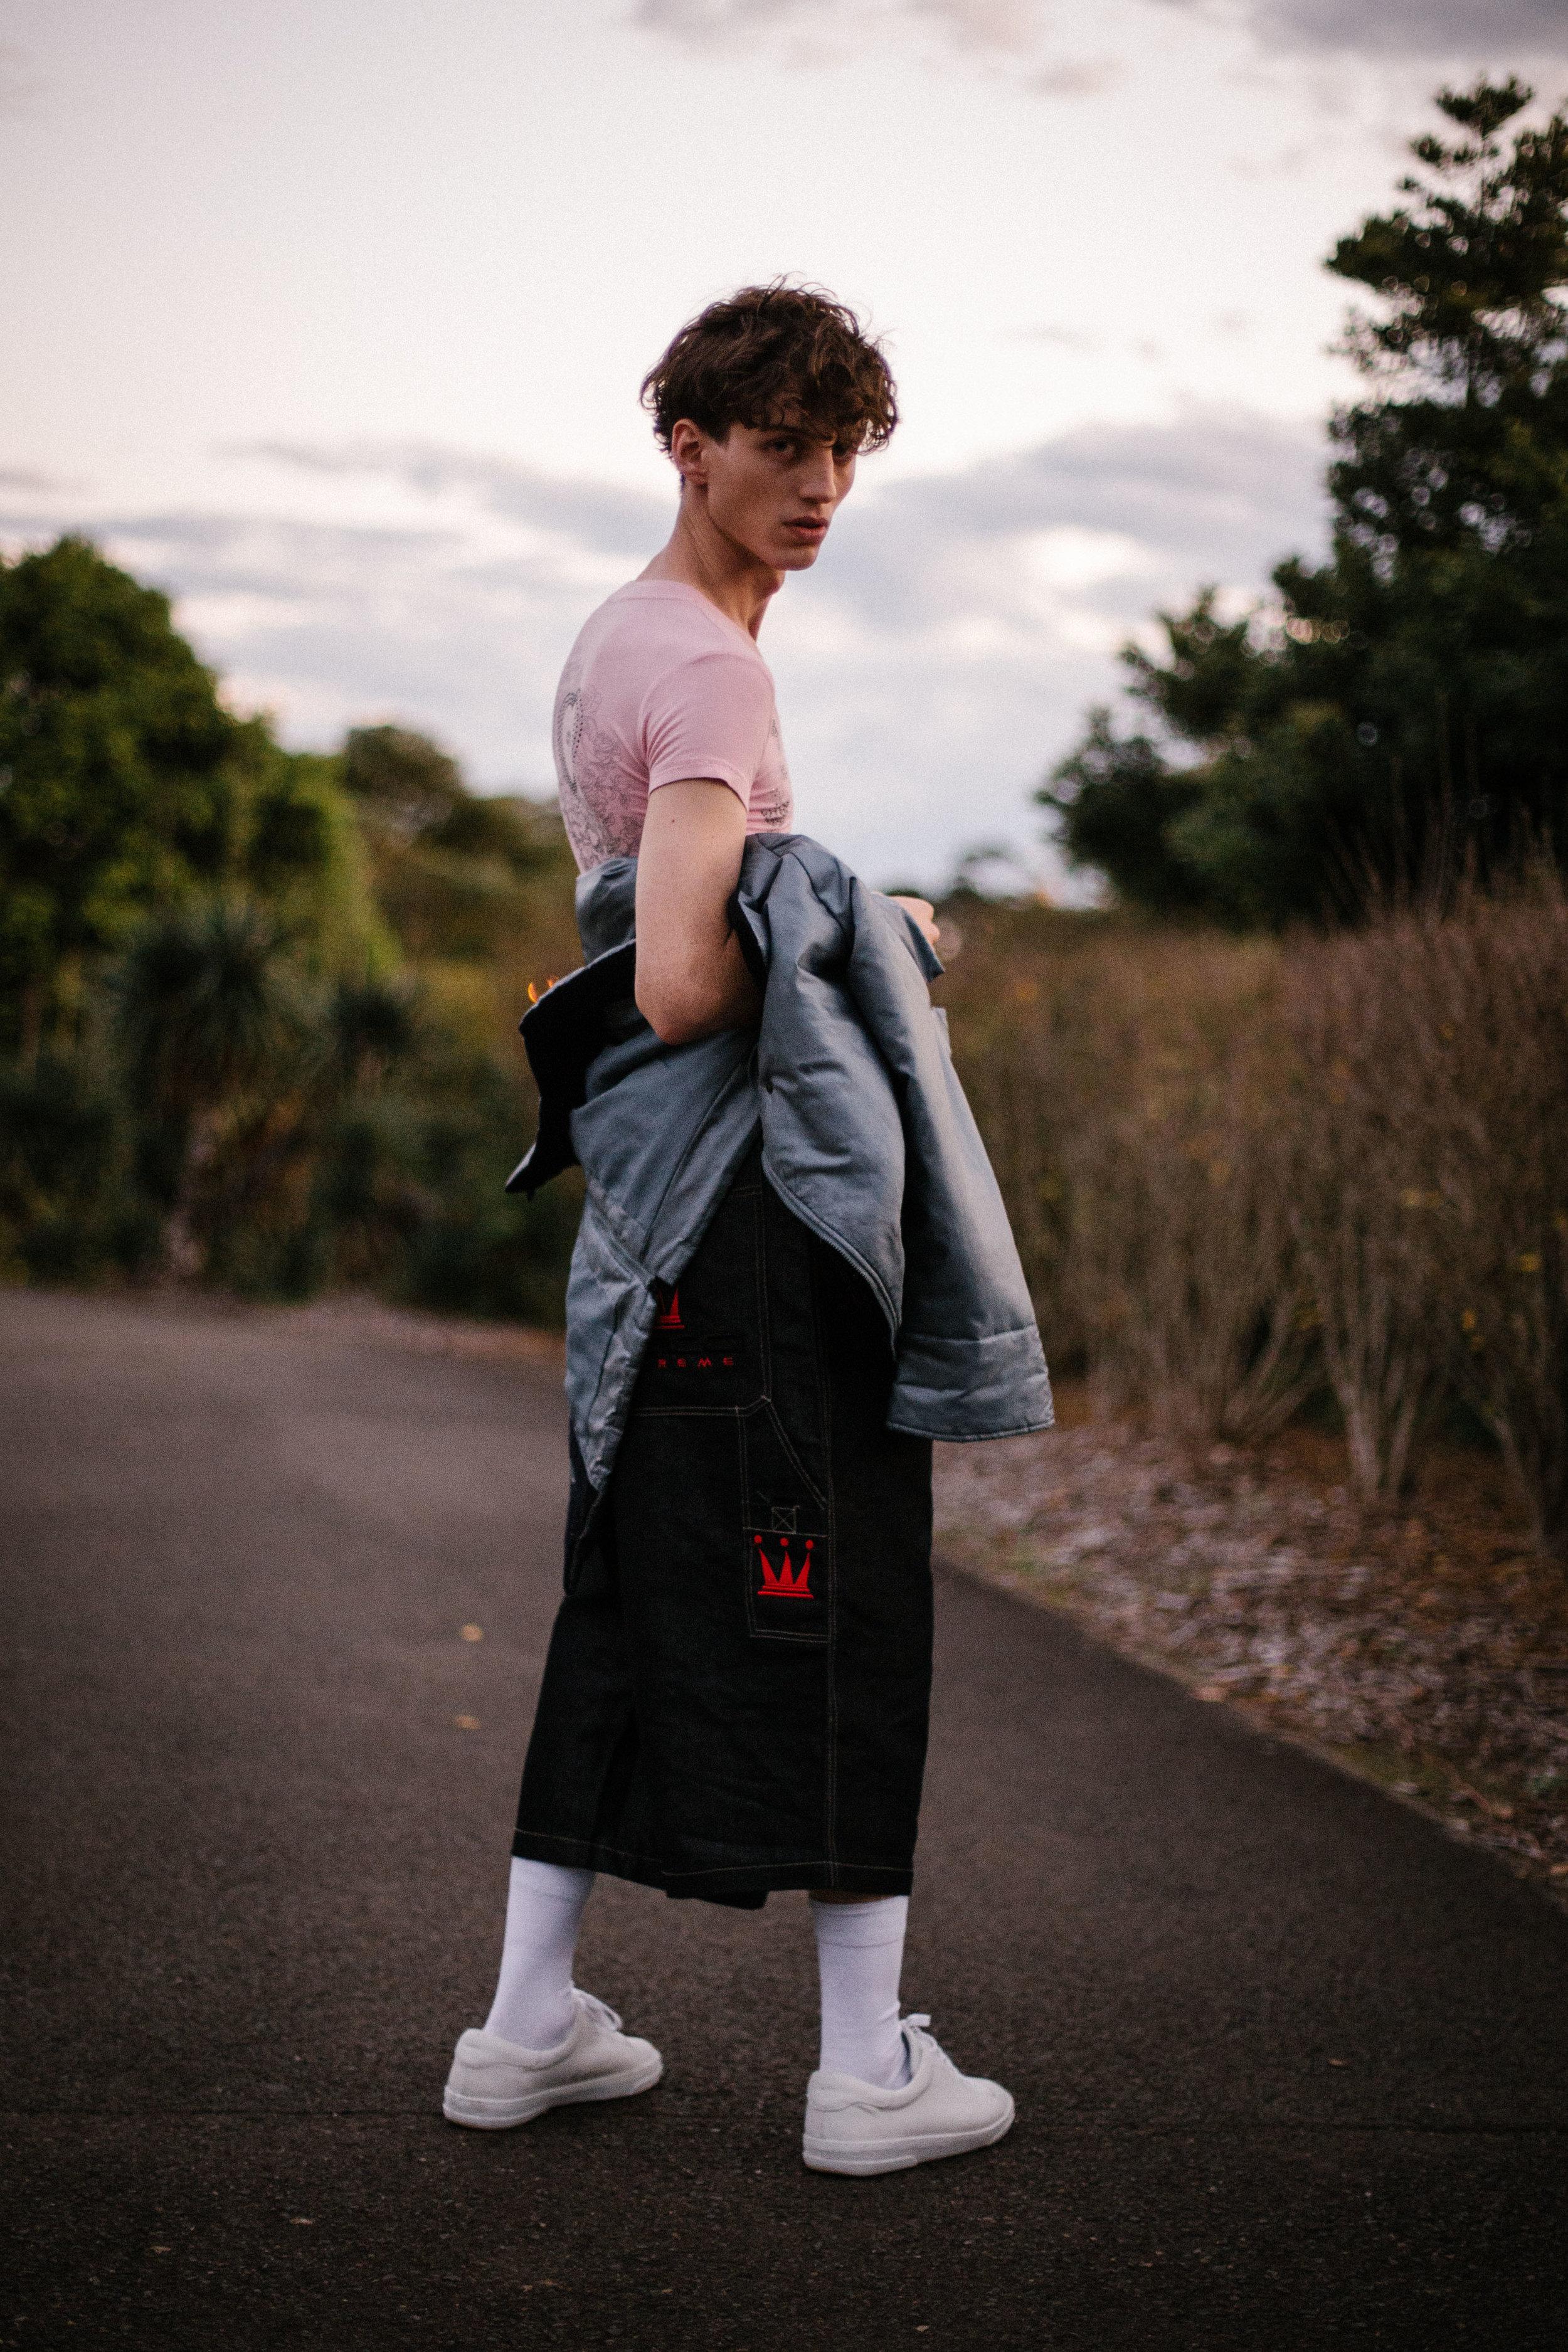 shirt Dior, jacket Dior, pants Dada, shoes A.P.C .